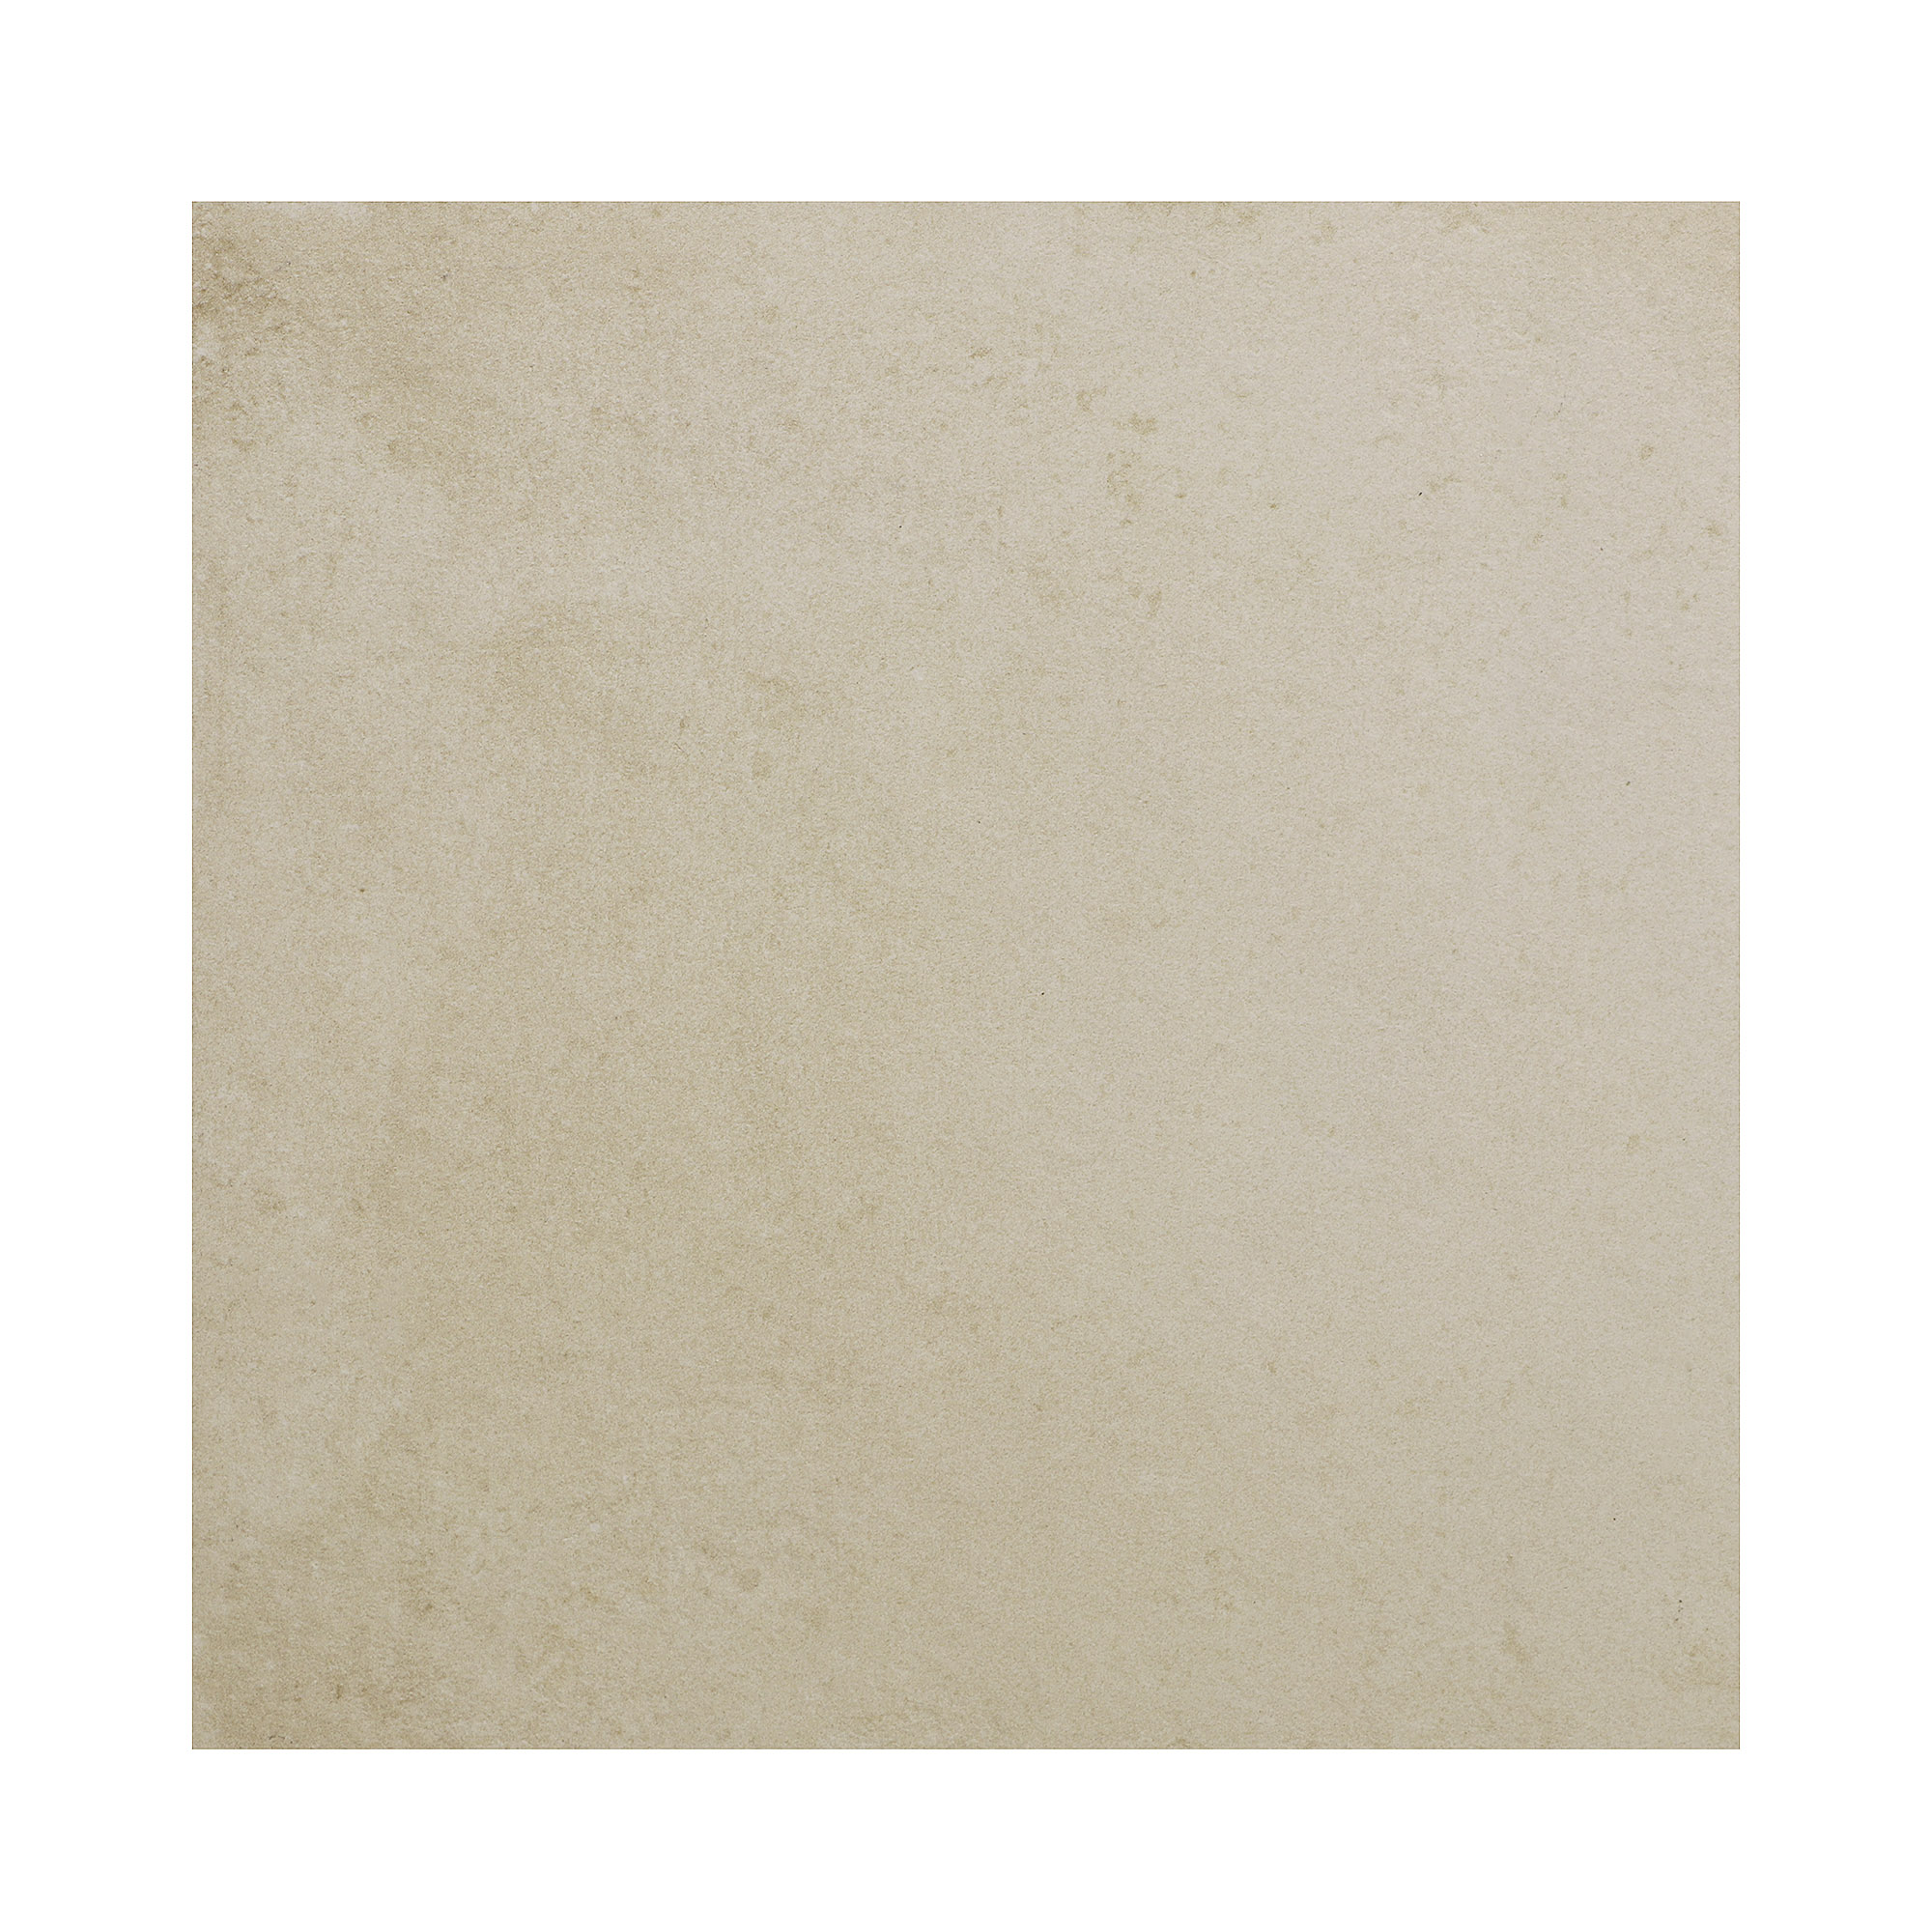 Плитка стена/пол Keratile nanotech sand 60x120